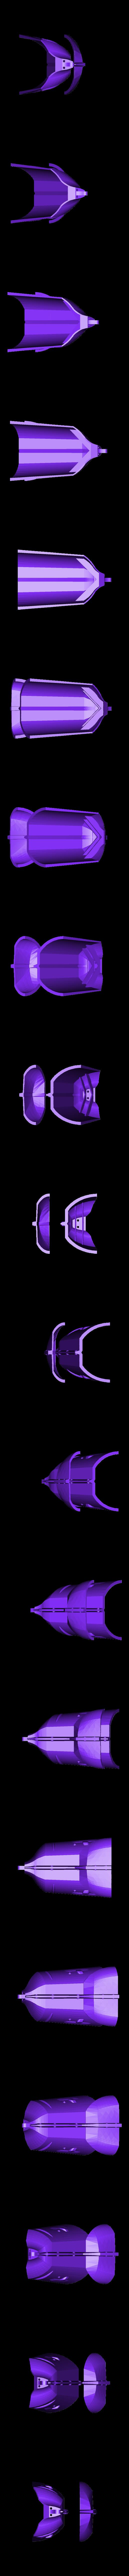 NewLampShade_AC_V2_Split.stl Download free STL file Airbus Inspired Aviation Lamp - Remix • 3D printing design, FreeBug